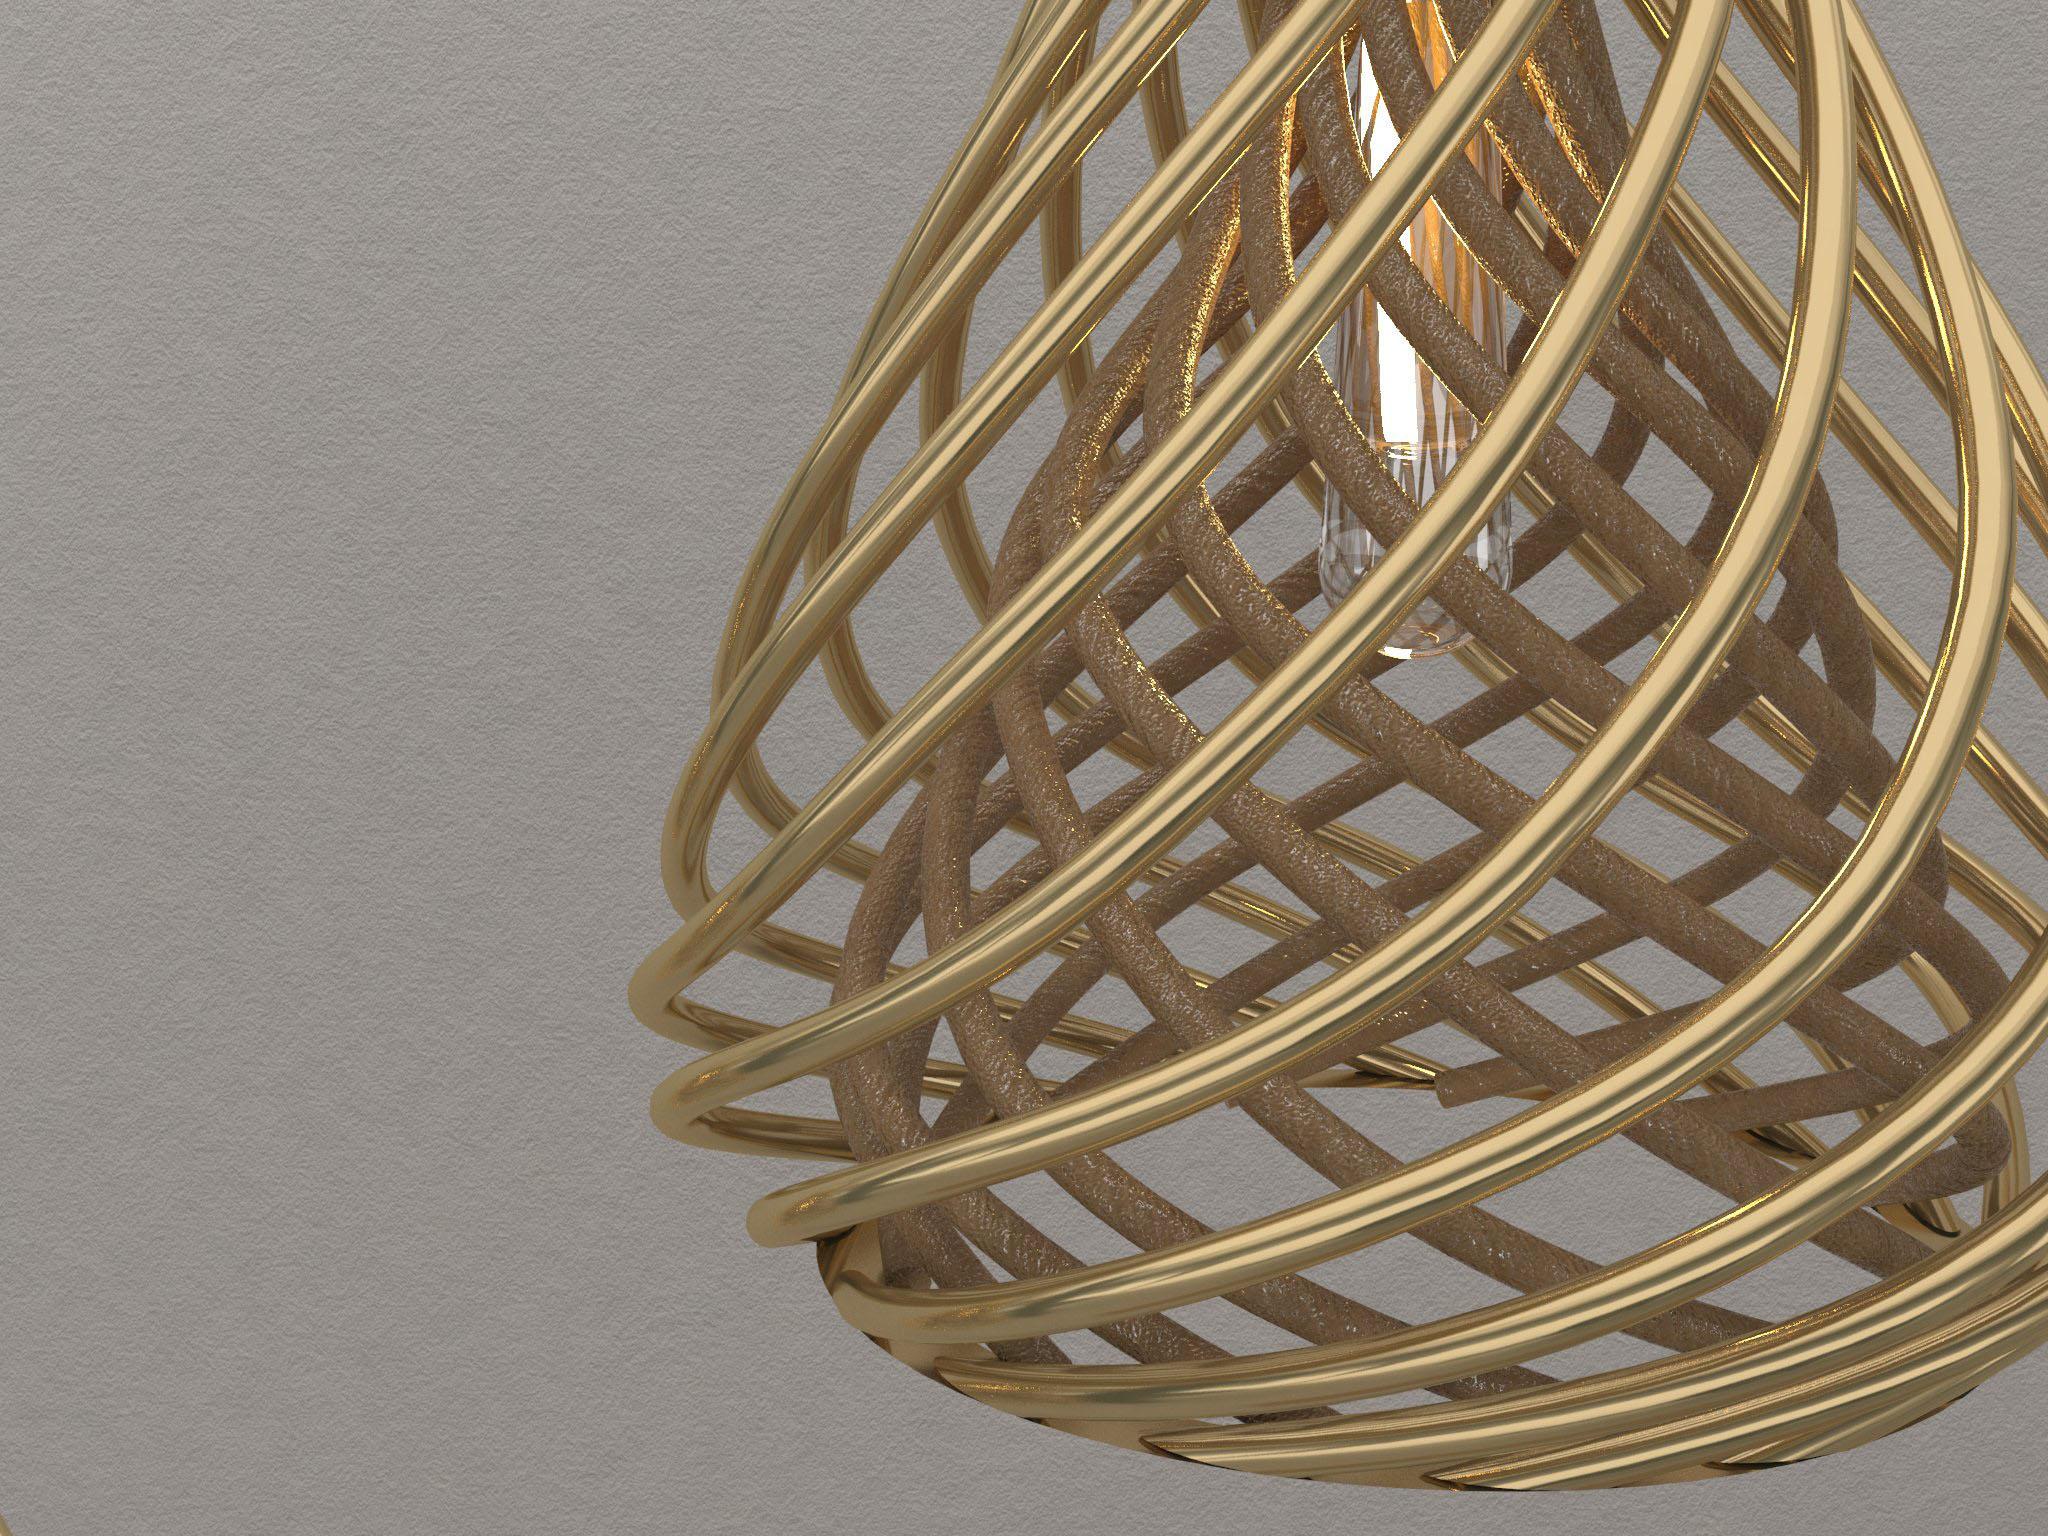 nest upclose.jpg